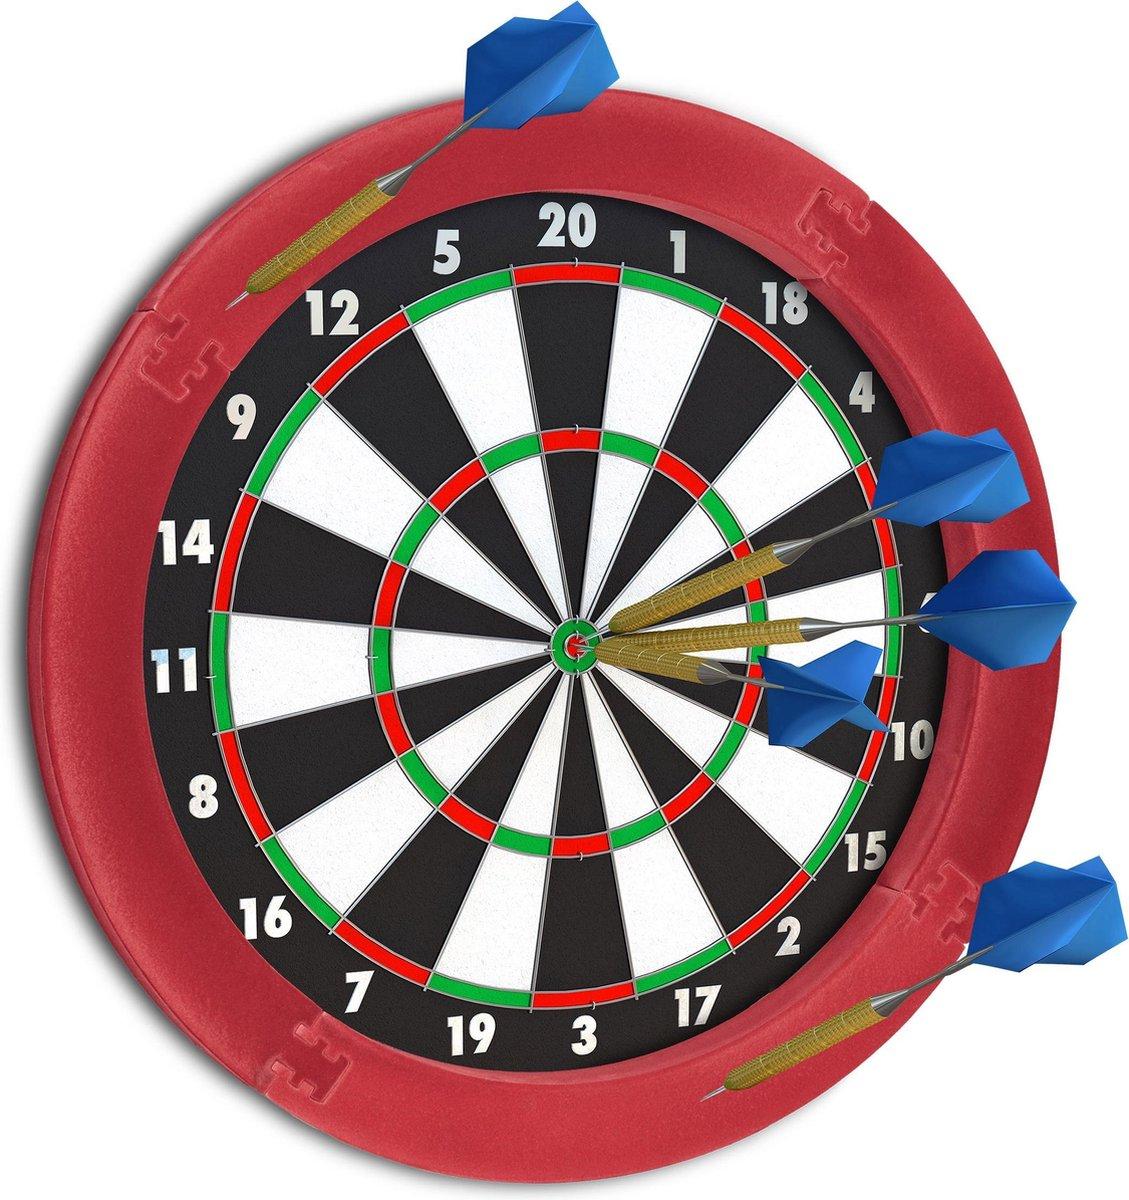 relaxdays dartbord surround ring - beschermrand - beschermring - ring voor dartbord - rond